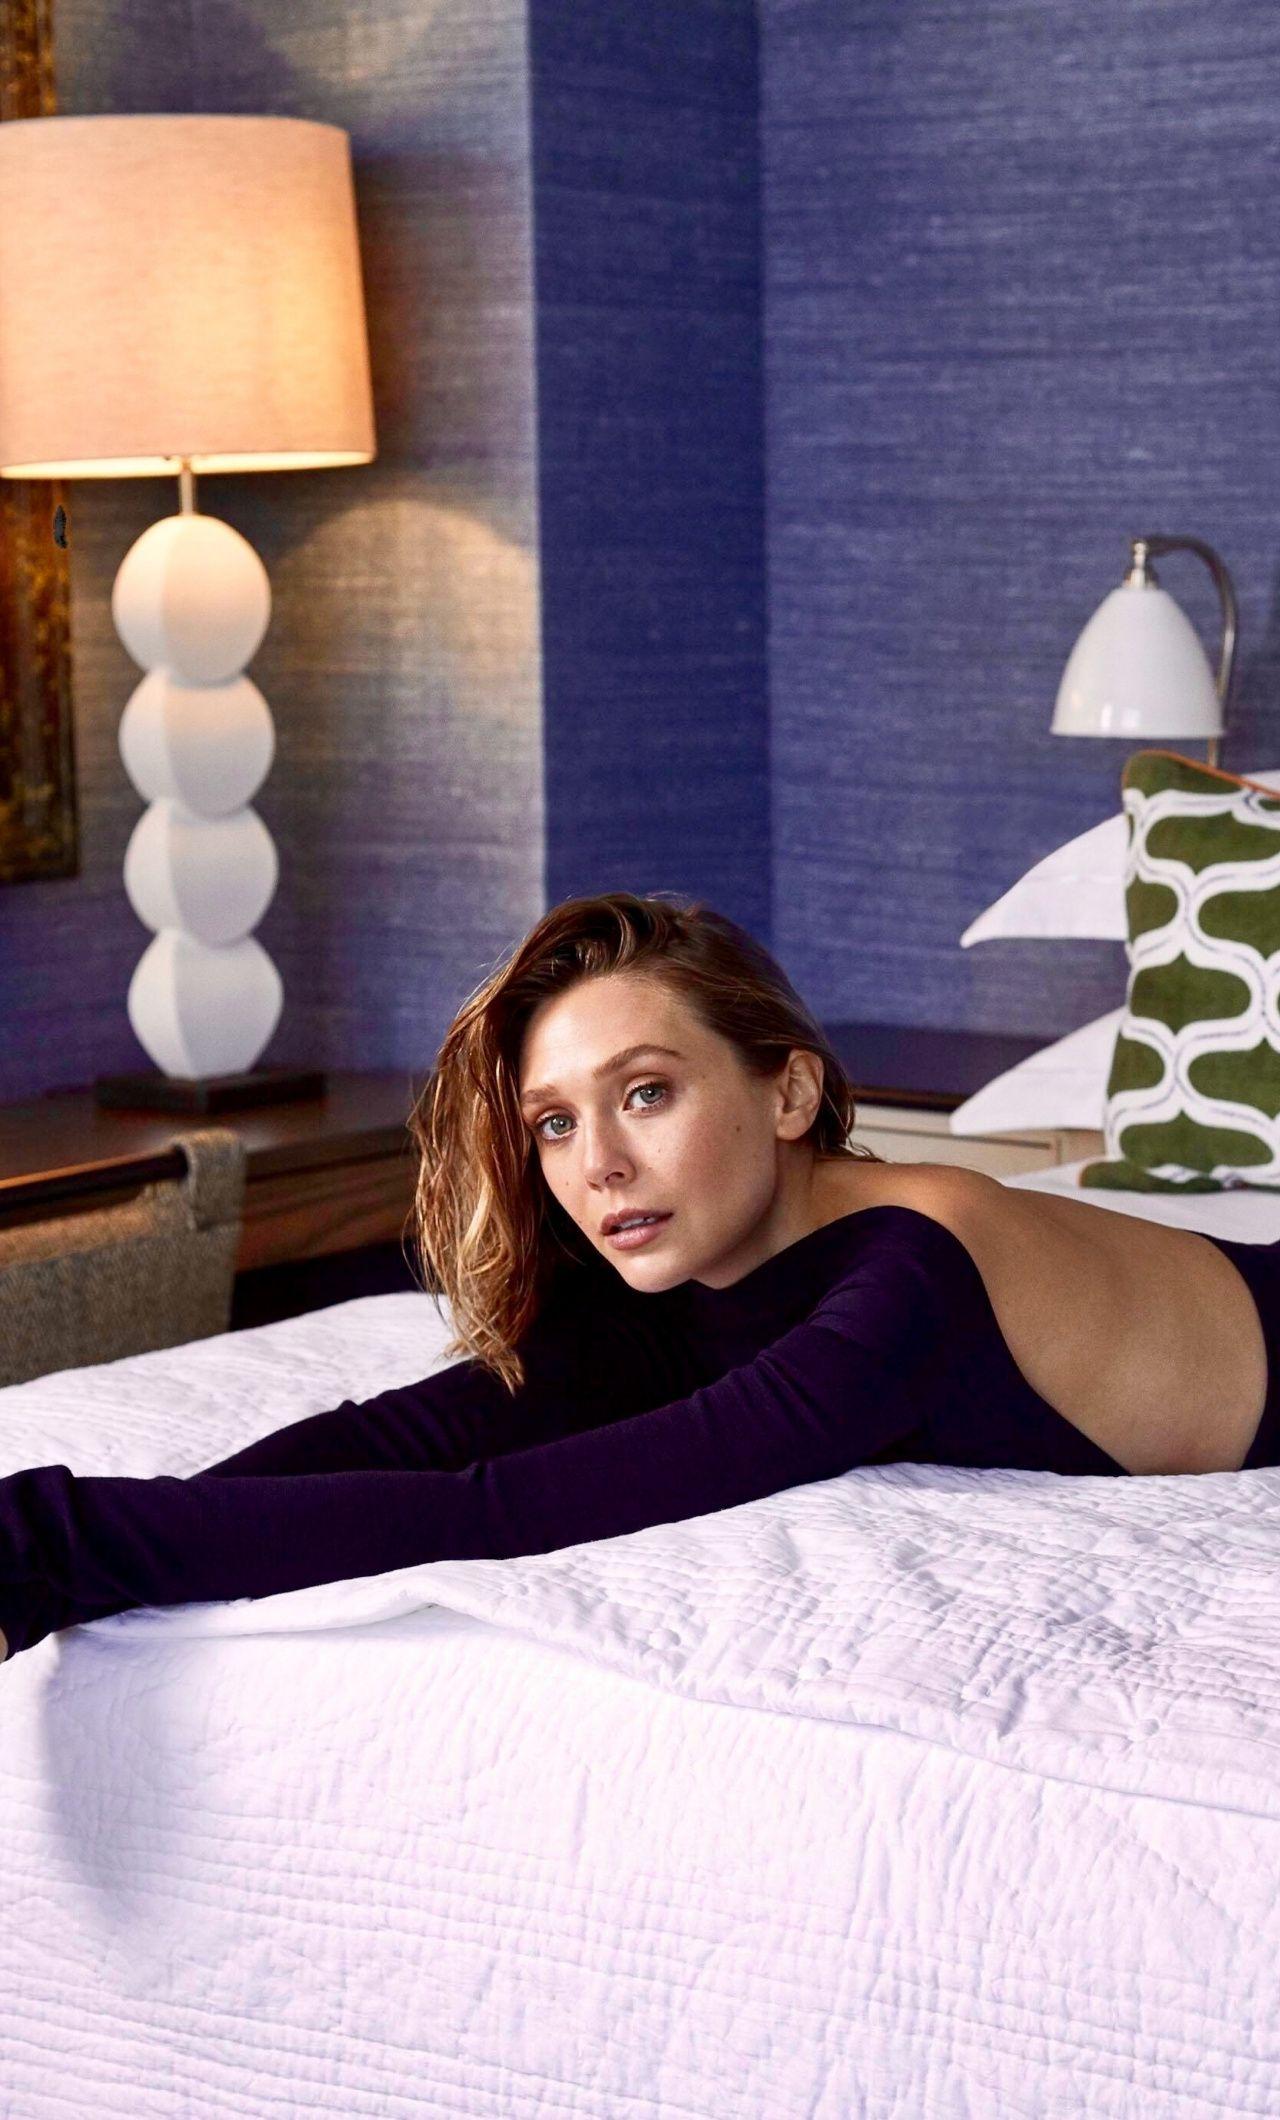 8c2efdcf9c36bfe461dc65aa29c97500 - Wallpaper Artis - Elizabeth Olsen, aktris, wallpaper cantik